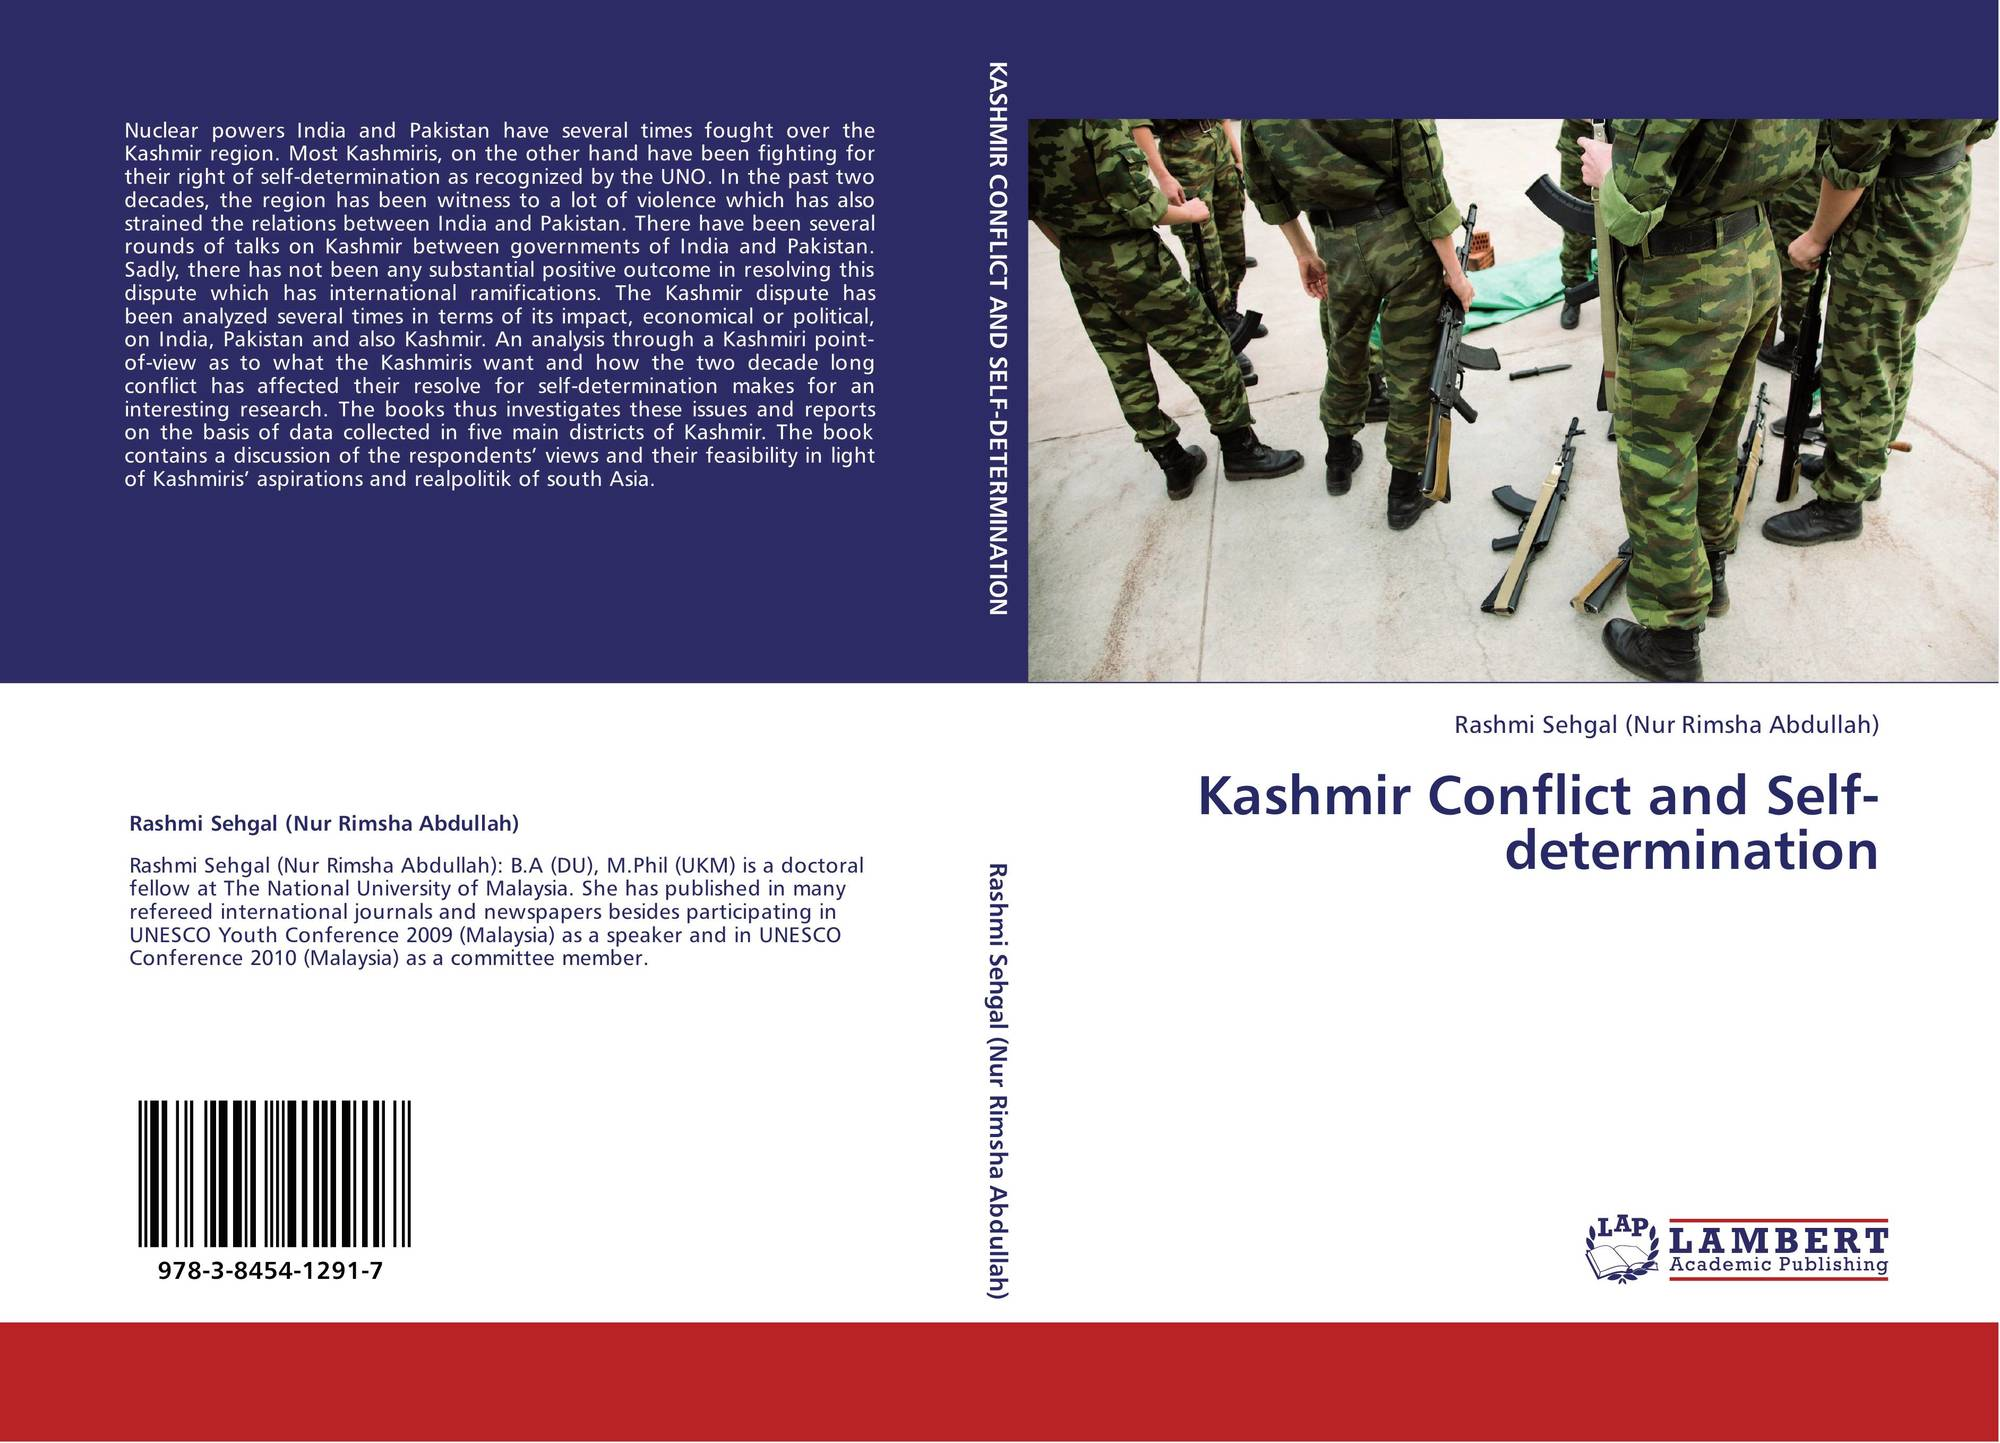 analysis with focus on the kashmir conflict Kas hmir conflict: a s t u d y o f w h a t l e d t o t h e i n s u r g e n c y i n k as h m i r v a l l e y & p r o p os e d the ongoing conflict over kashmir.